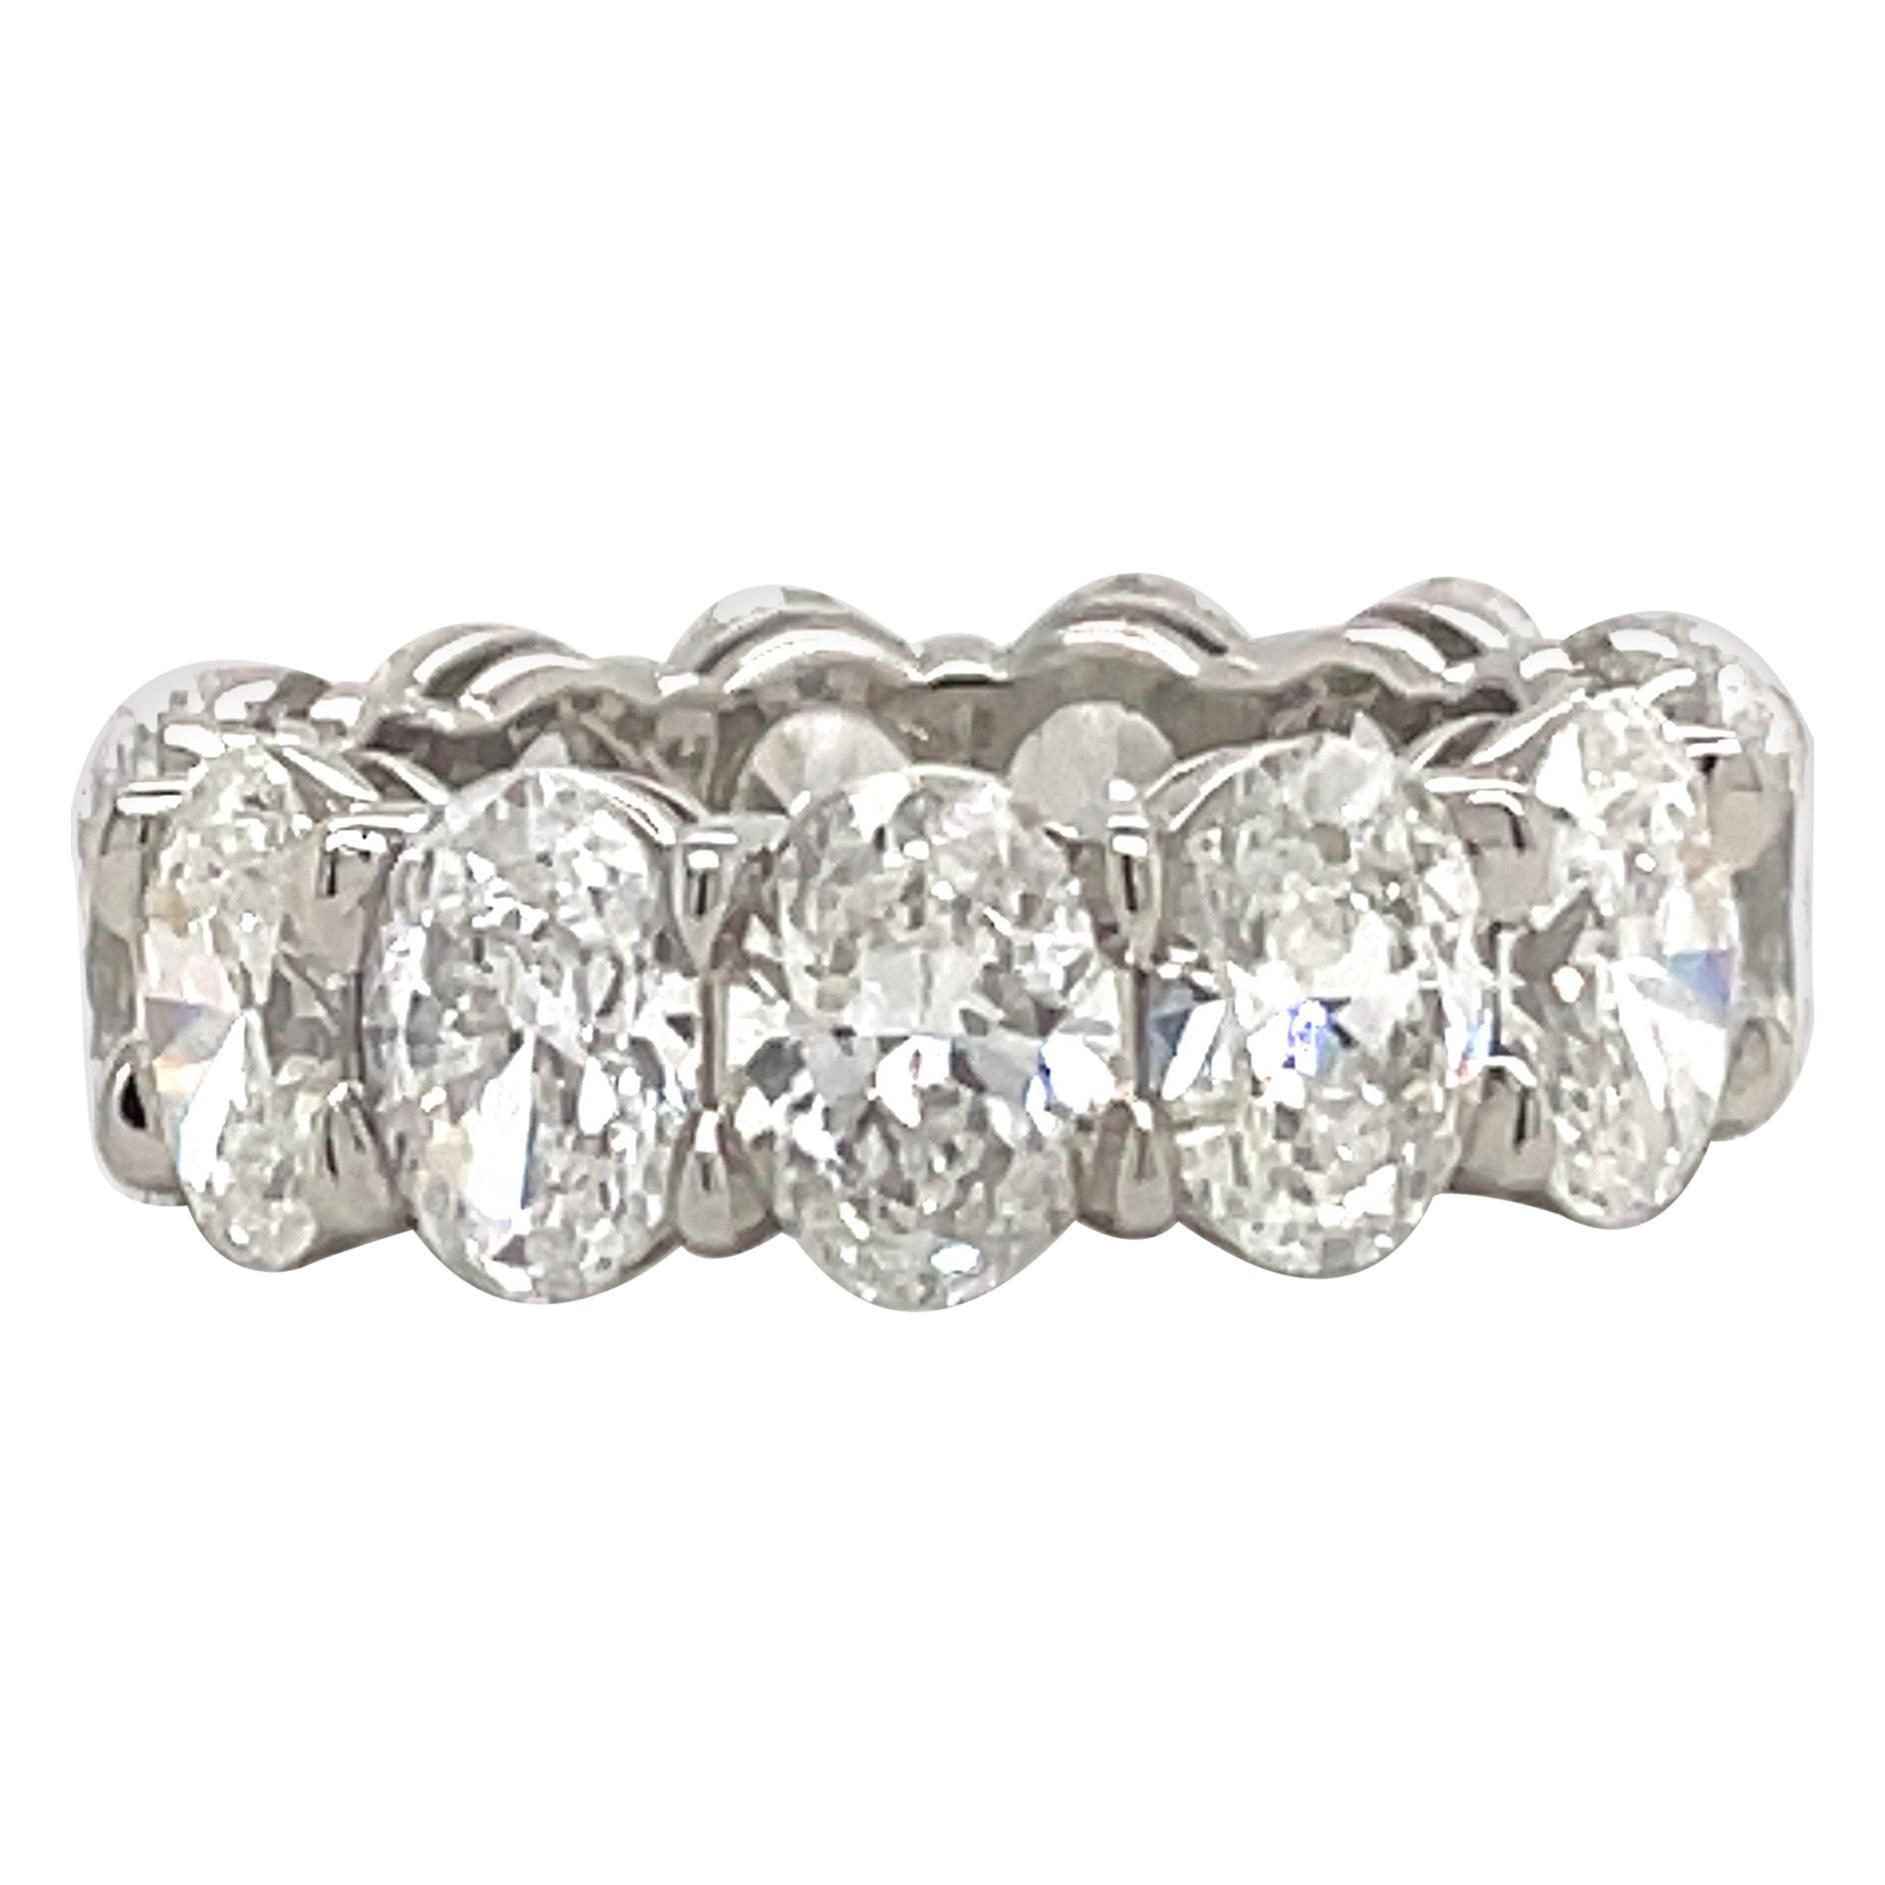 ALL GIA Certified Oval Cut Diamond Wedding Band 9.11 Carat D-F VVS-VS Platinum